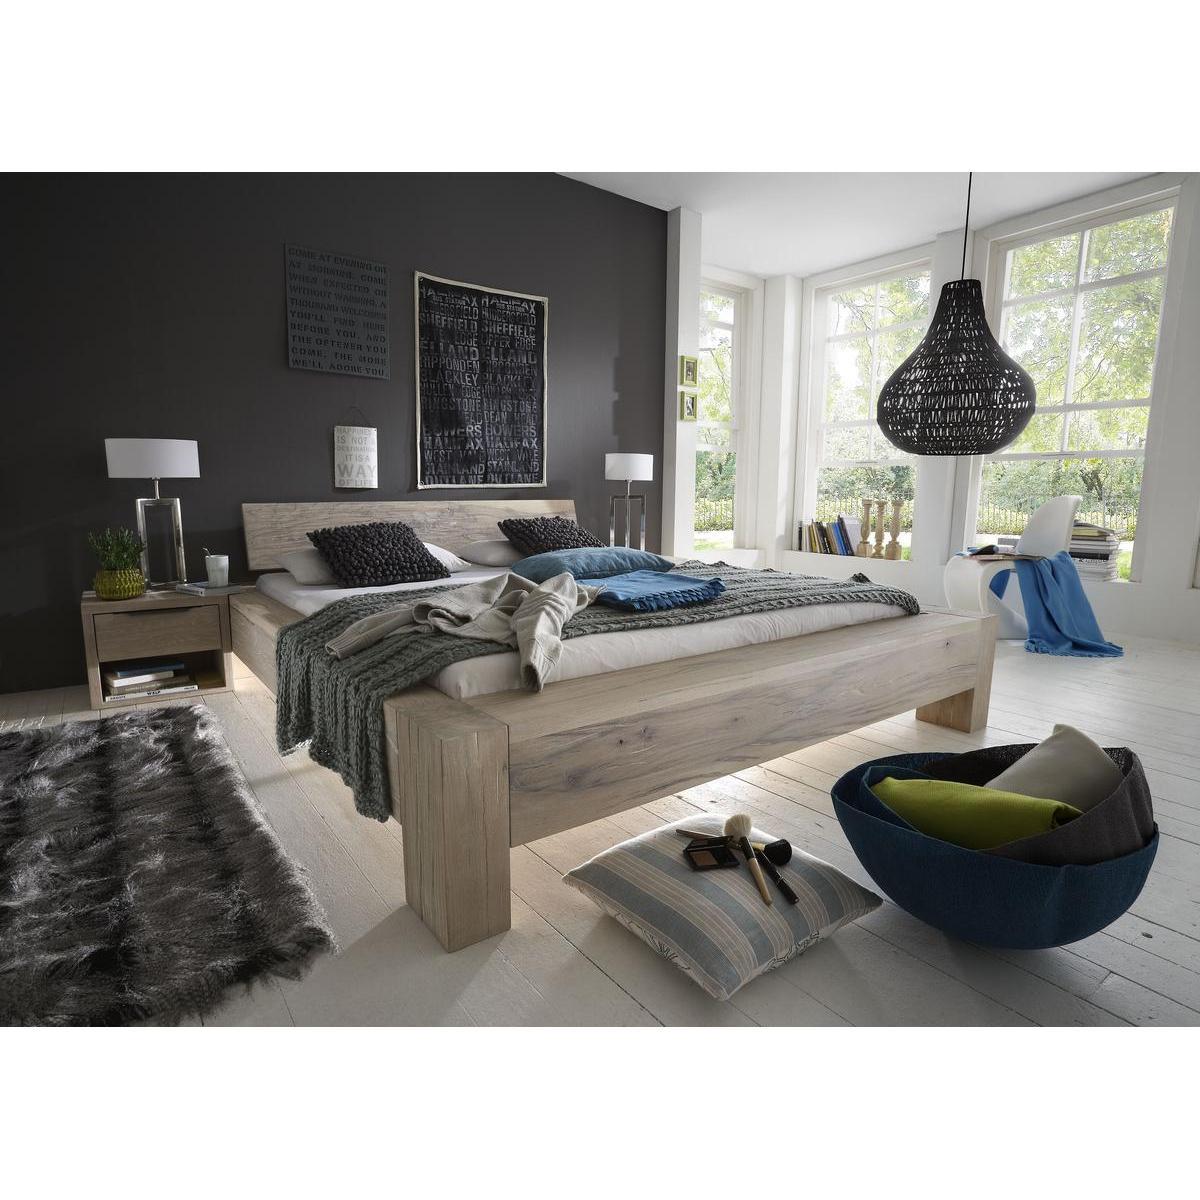 echtholz balkenbett 200x200 heavy sleep alba wildeiche massiv white wash 2220 26 2120 6. Black Bedroom Furniture Sets. Home Design Ideas